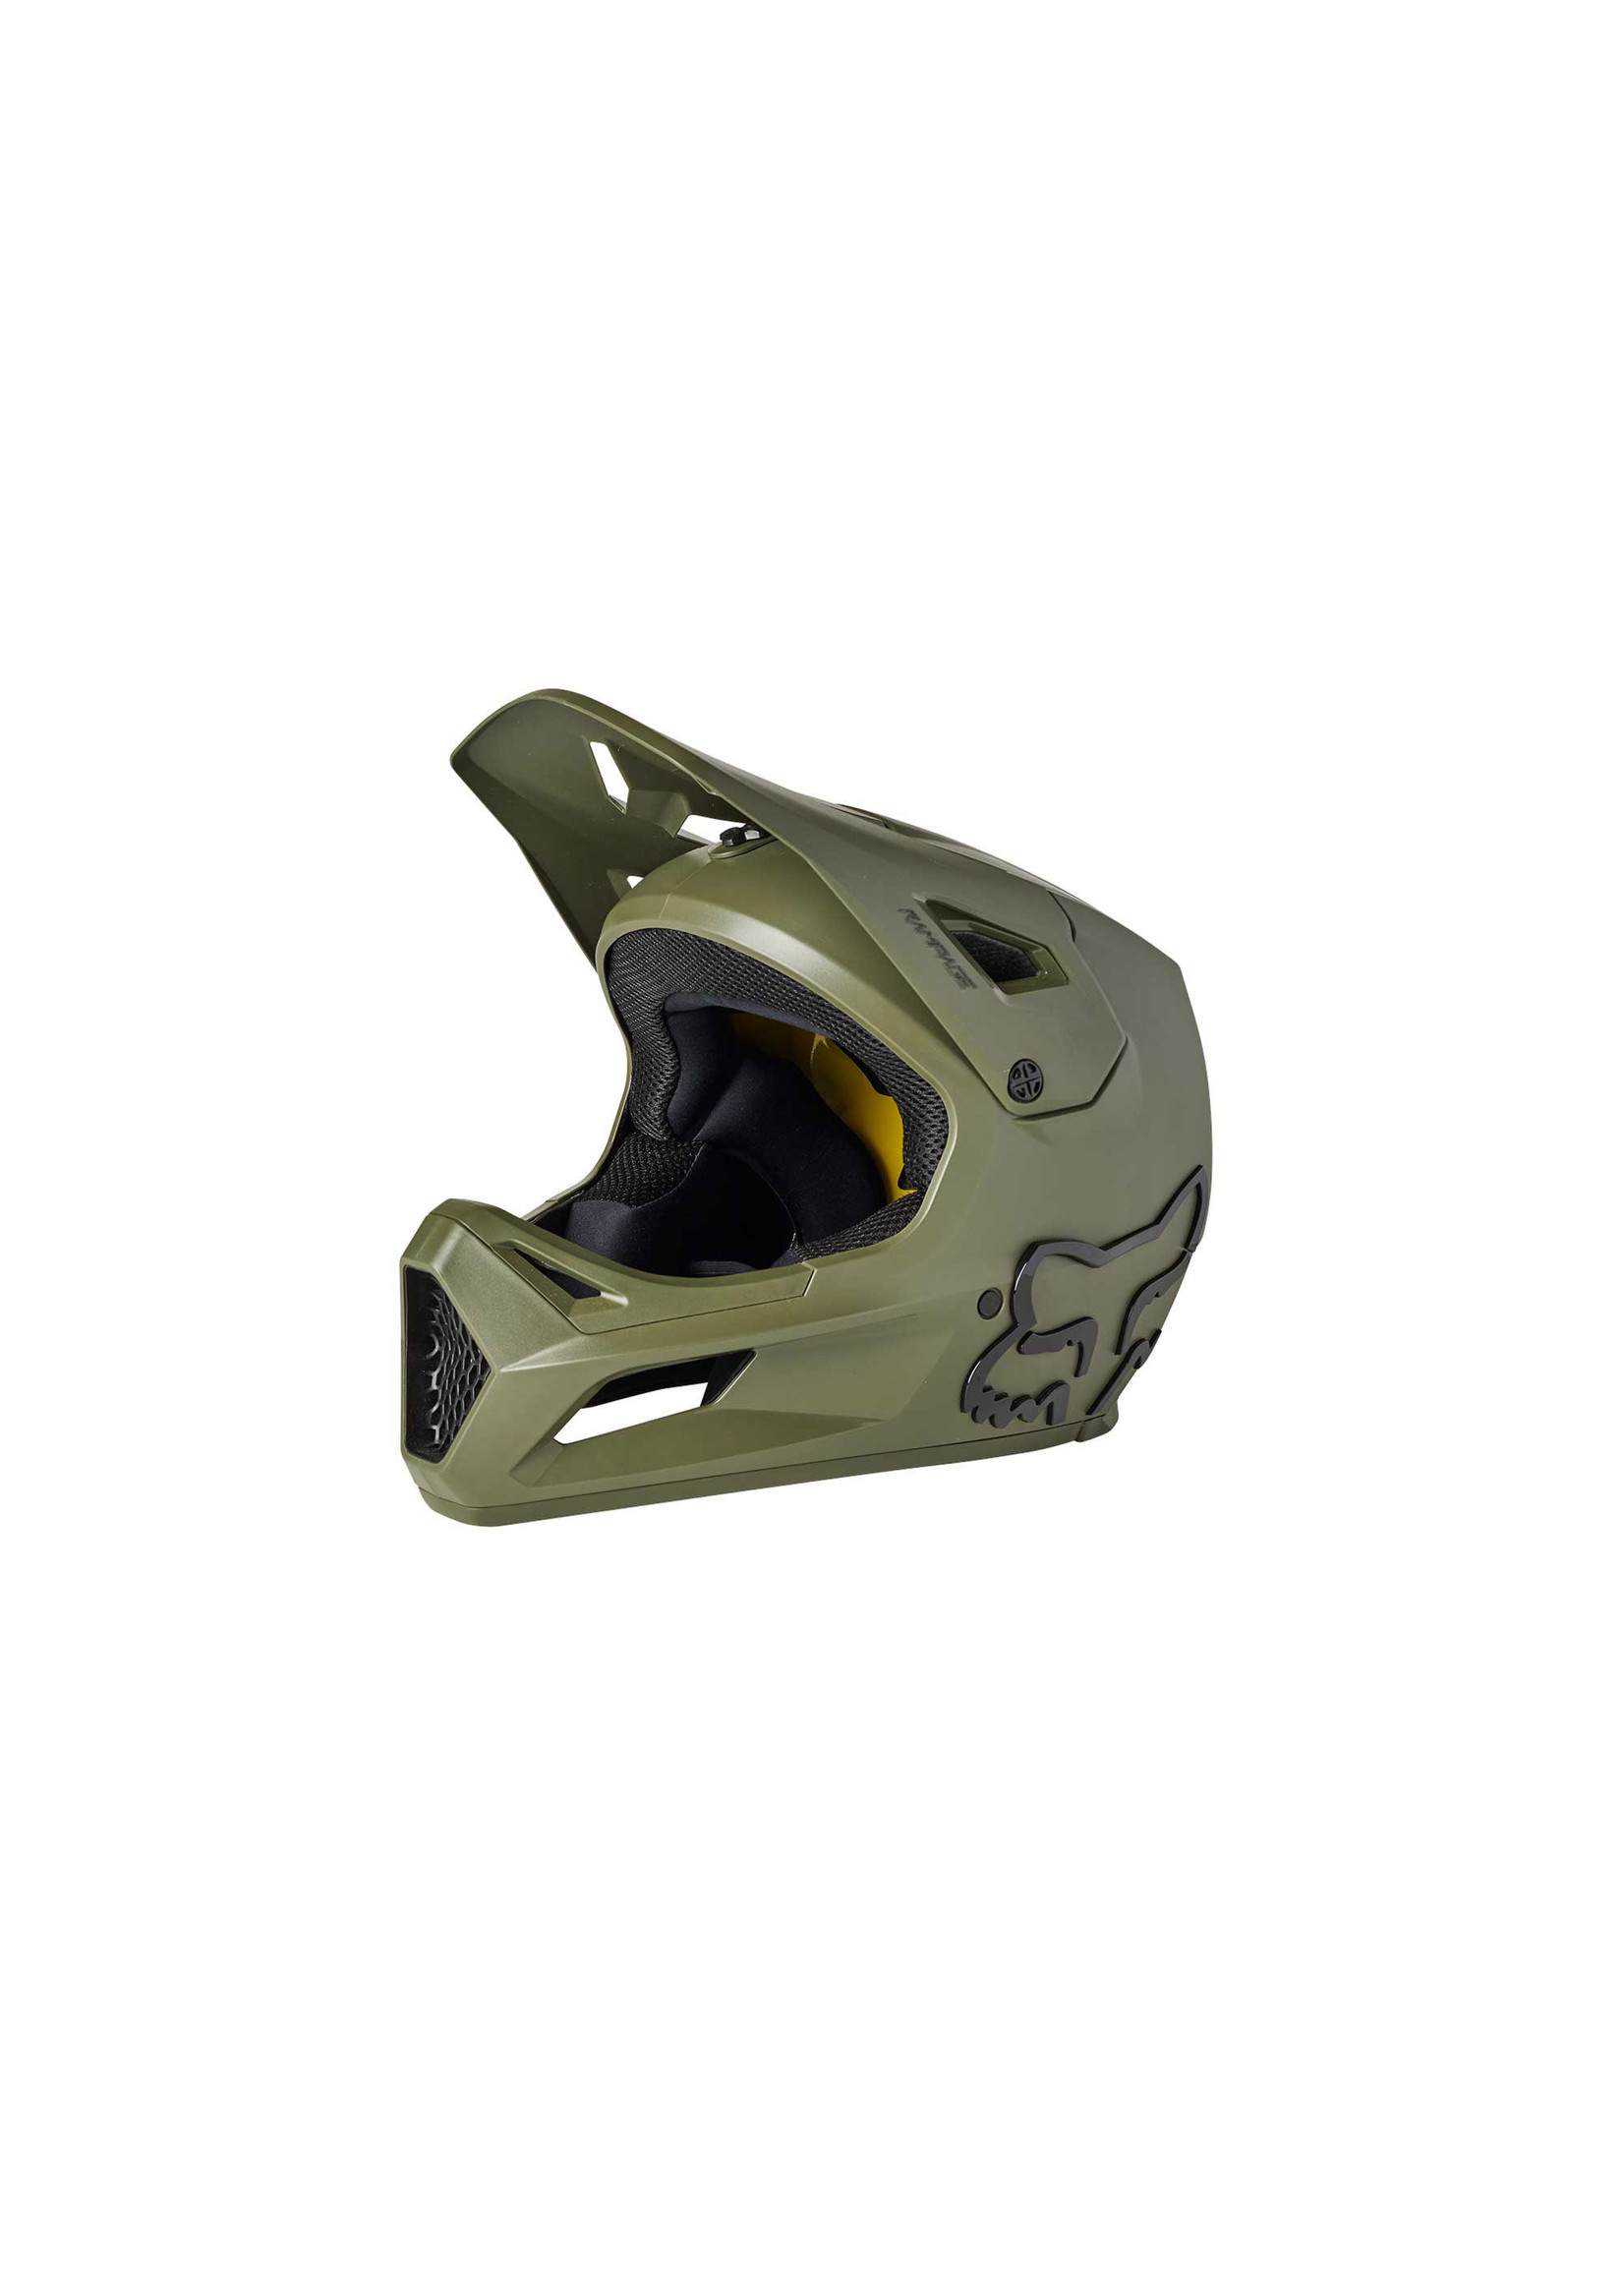 Fox Head Fox- Rampage Helmet, OLV GRN, Lrg